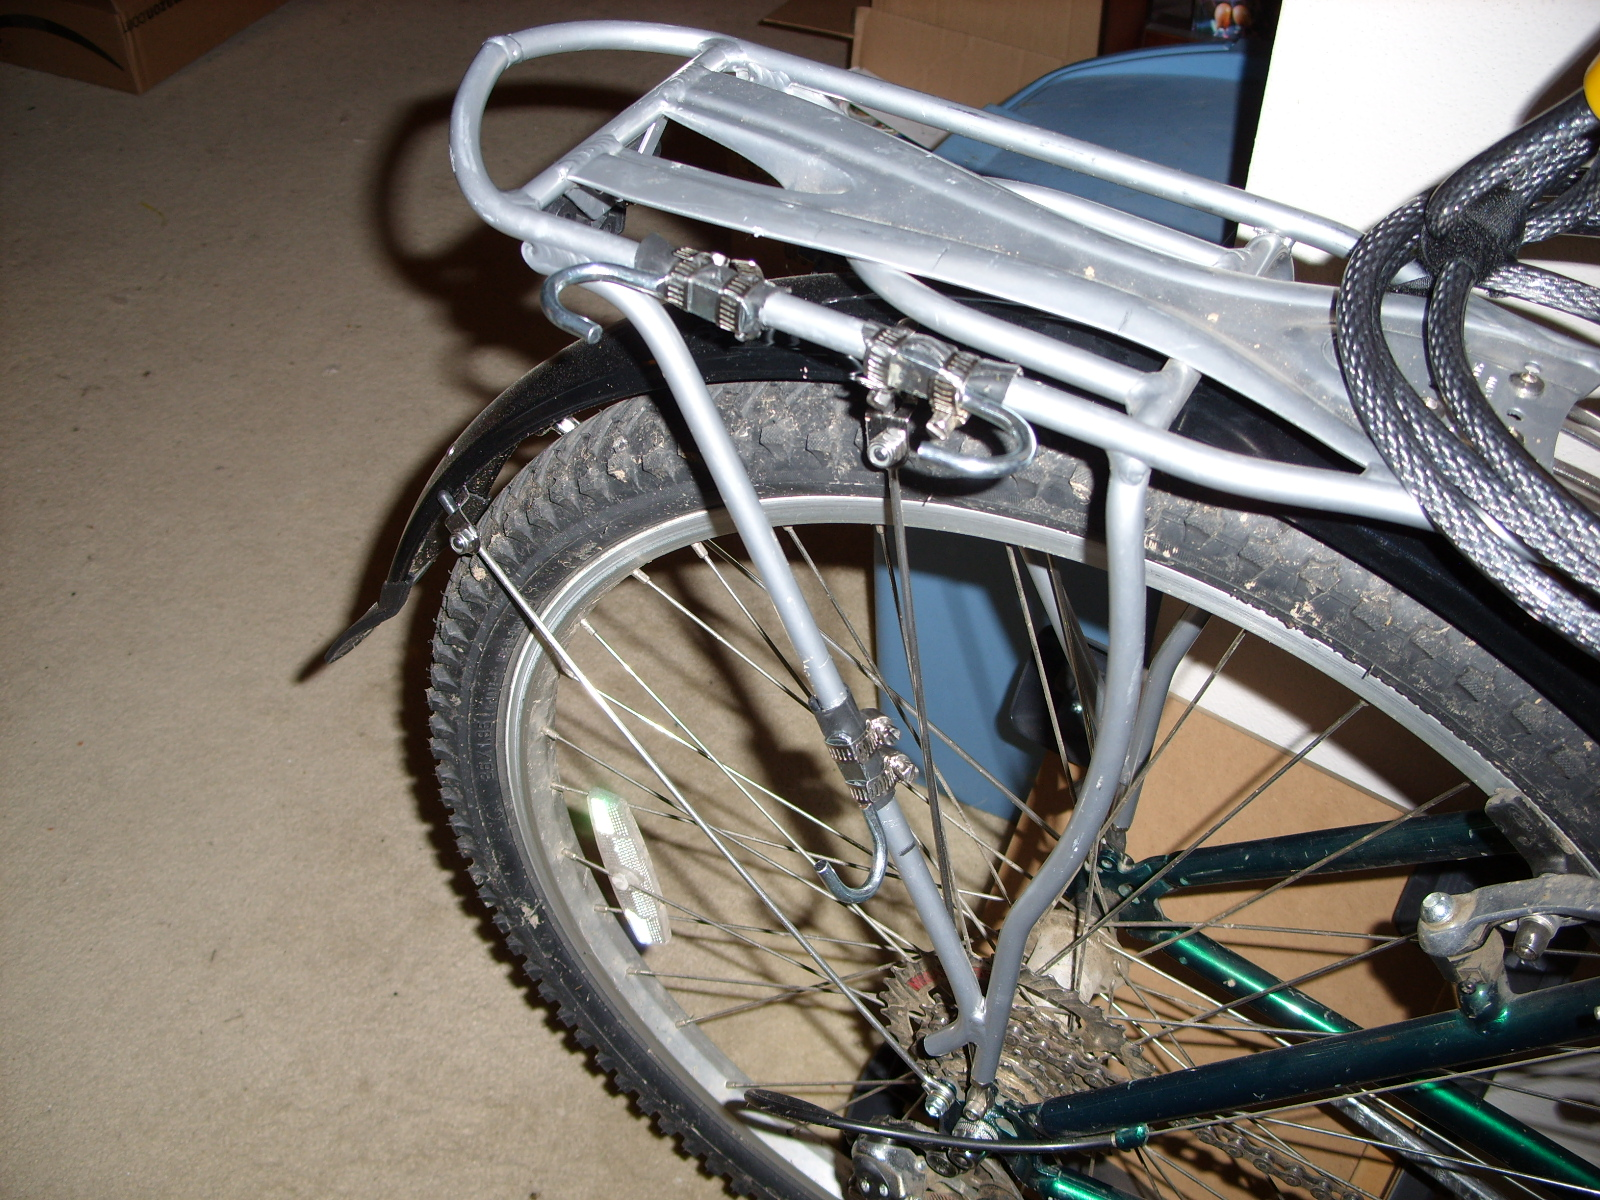 My Diy Bicycle Frame Or Rear Rack Mounted U Lock Holder